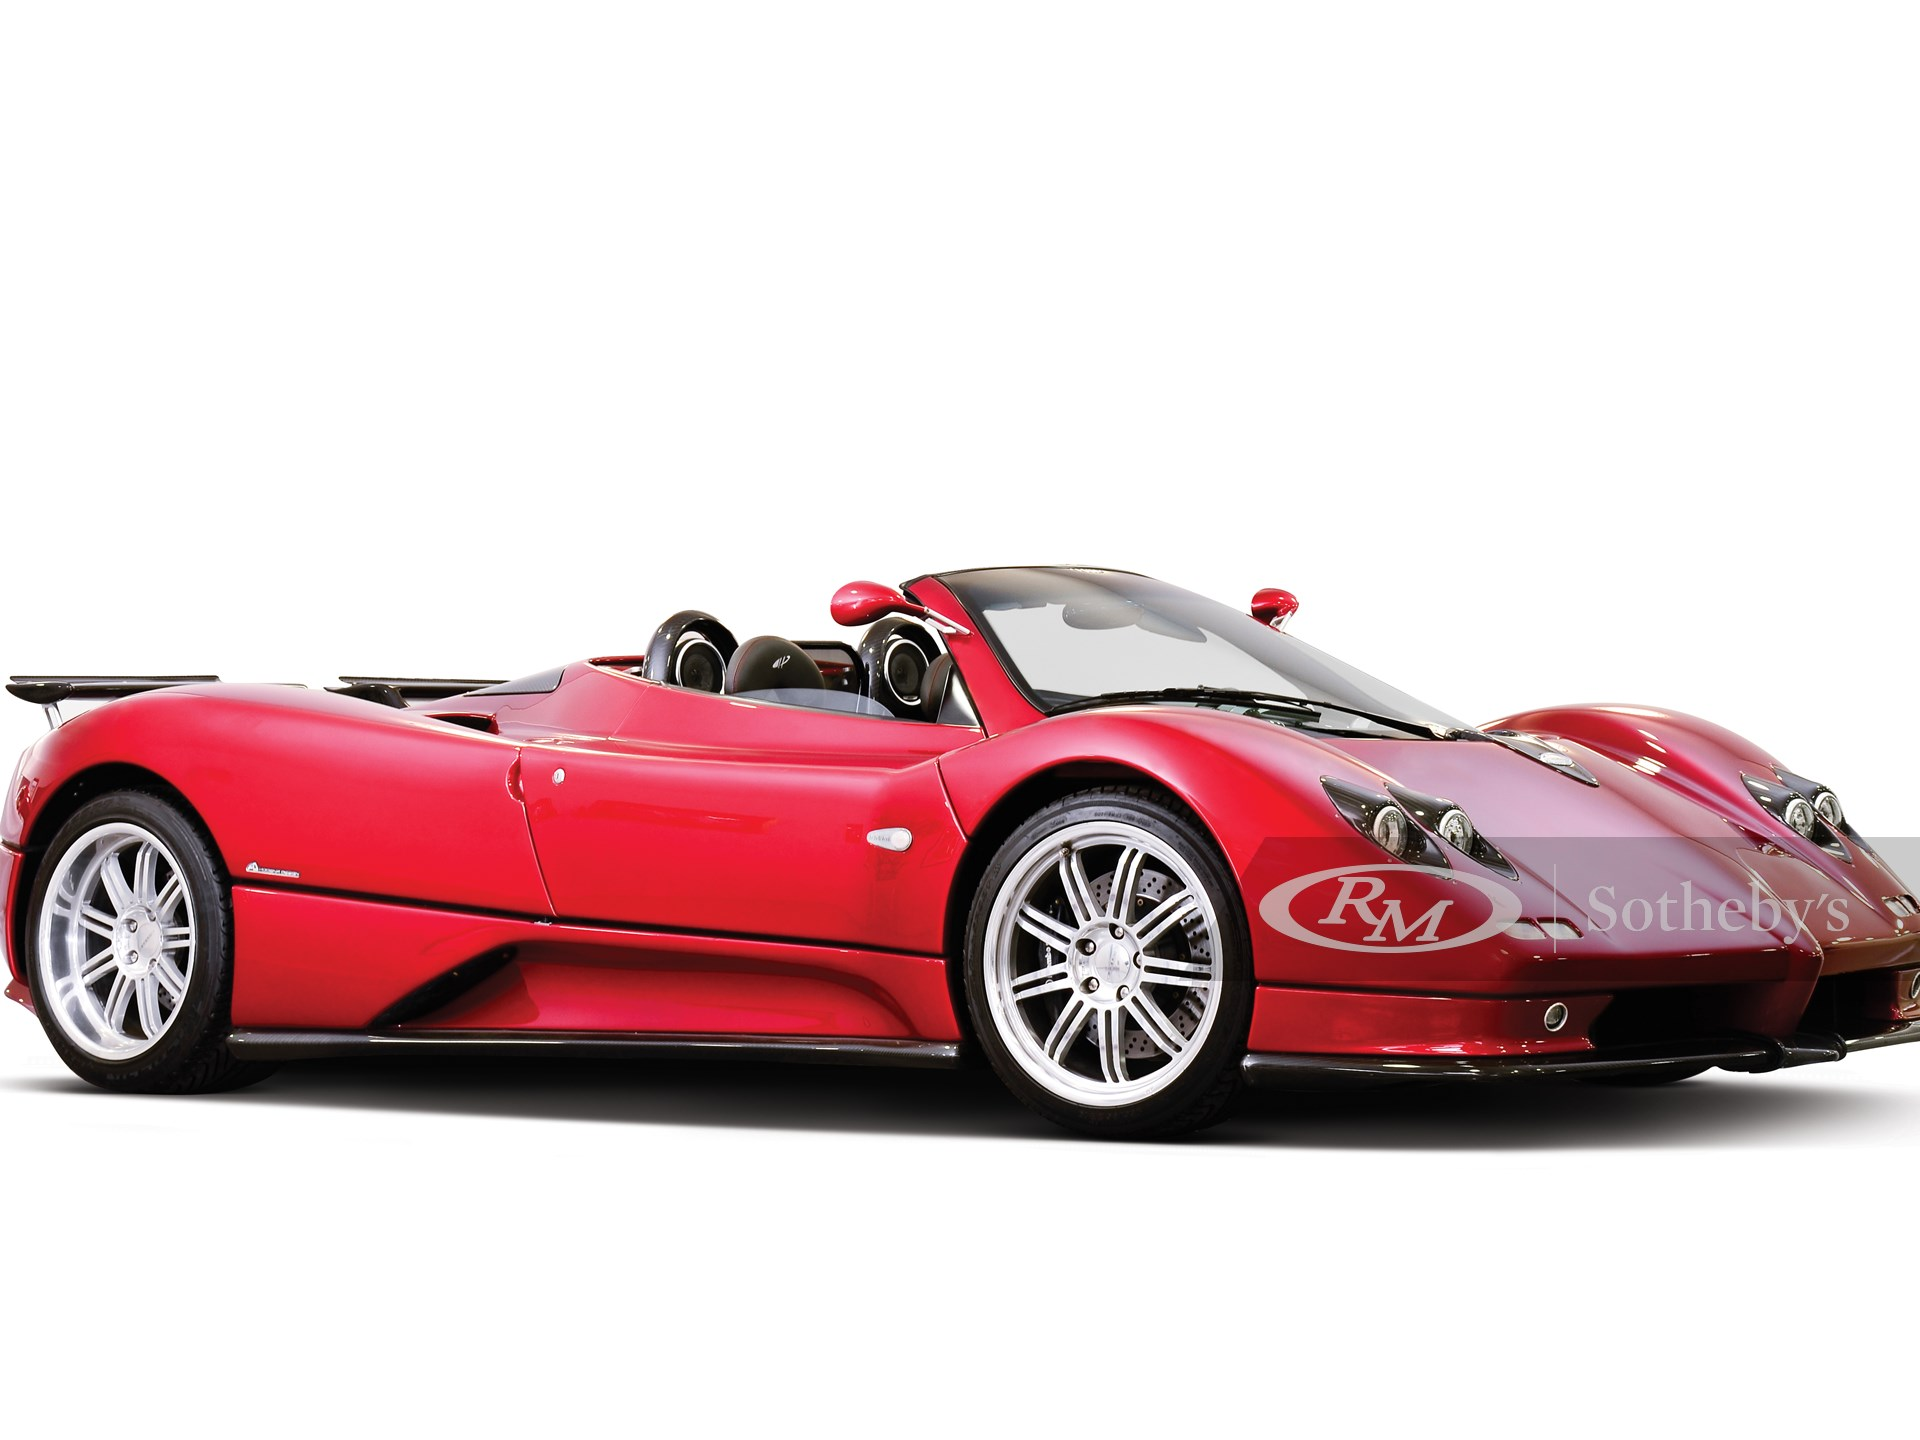 2005 Pagani Zonda C12 7.3 S Roadster